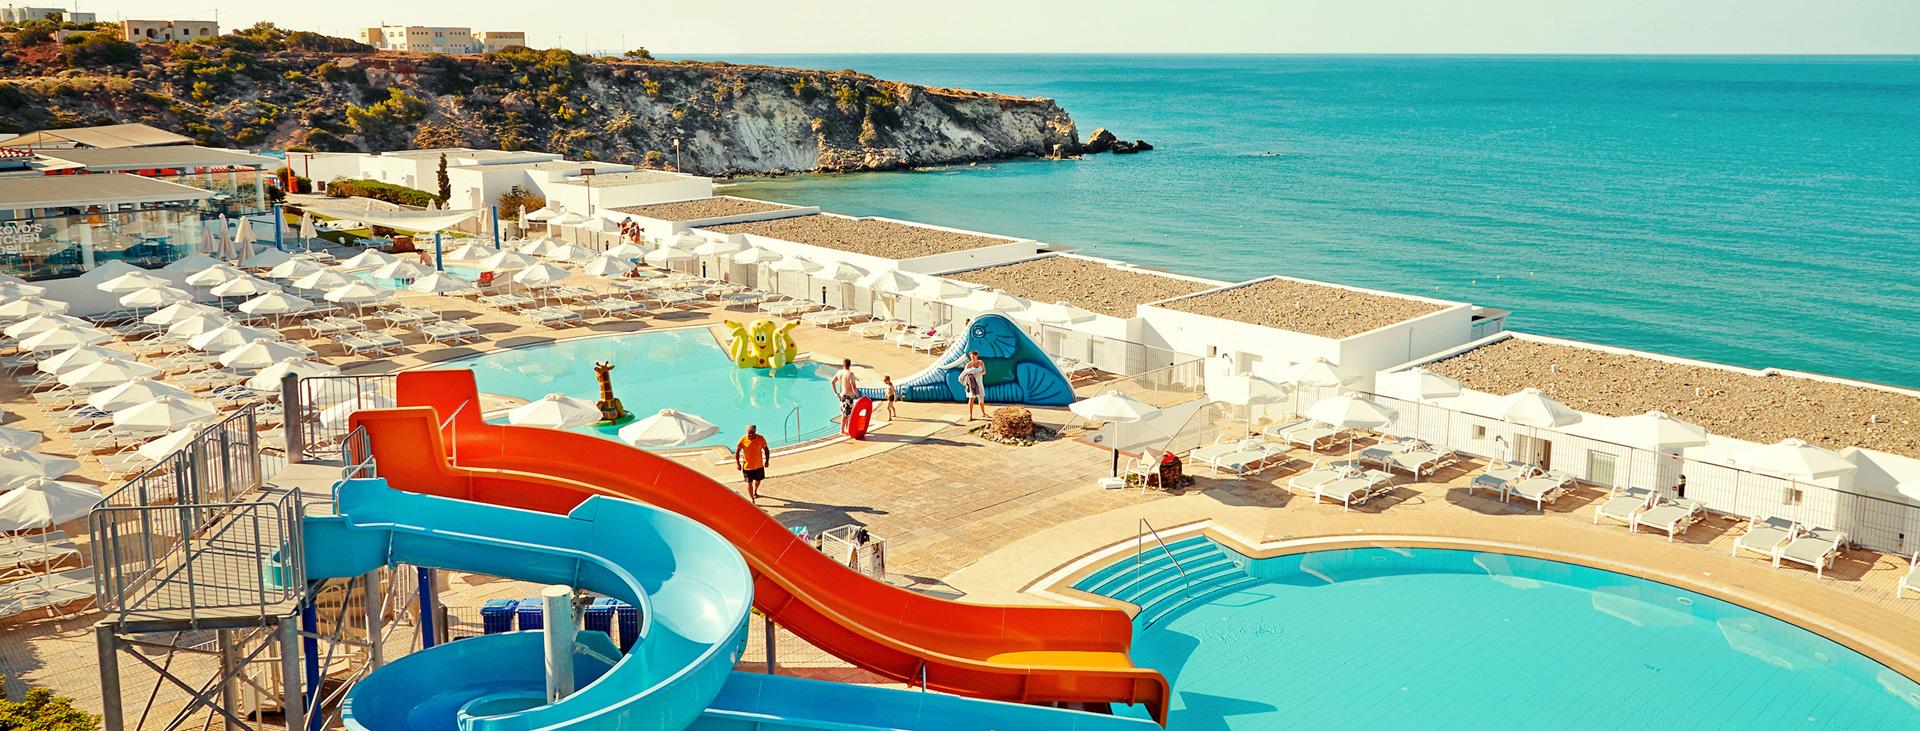 Sunwing Makrigialos Beach, Makrigialos, Kreeta, Kreikka